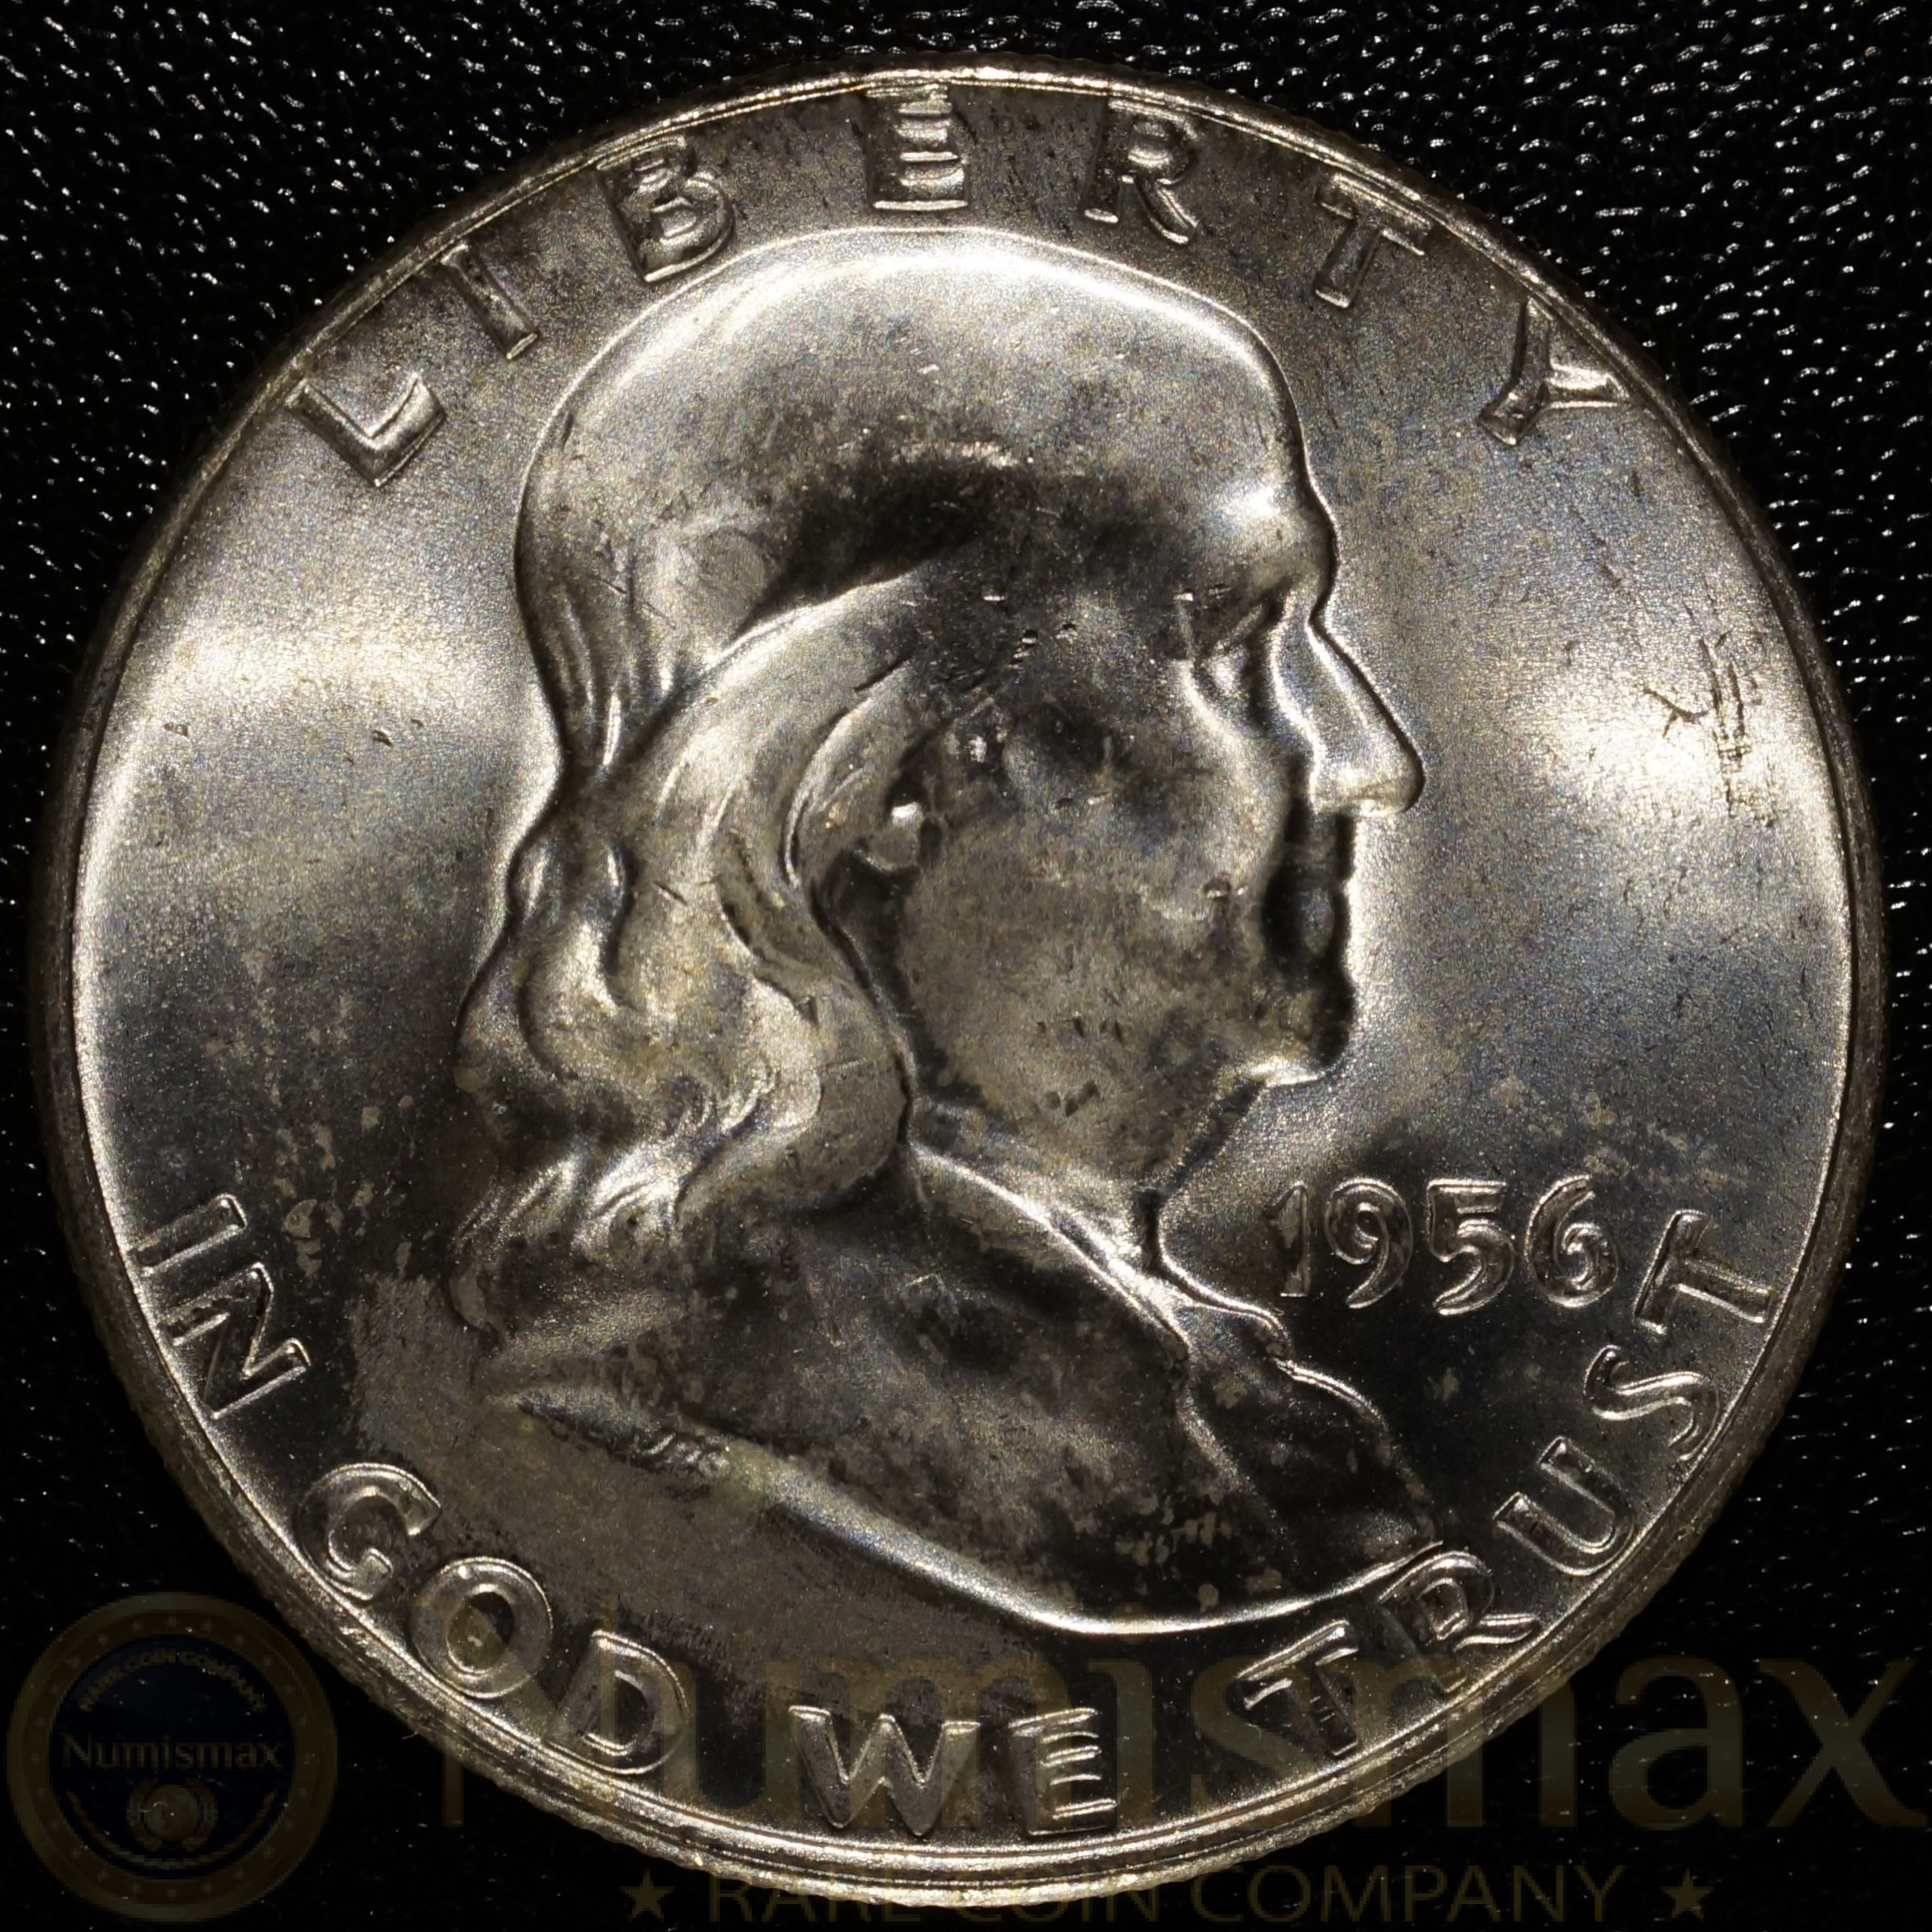 1956 Philadelphia Silver Franklin Half Dollar